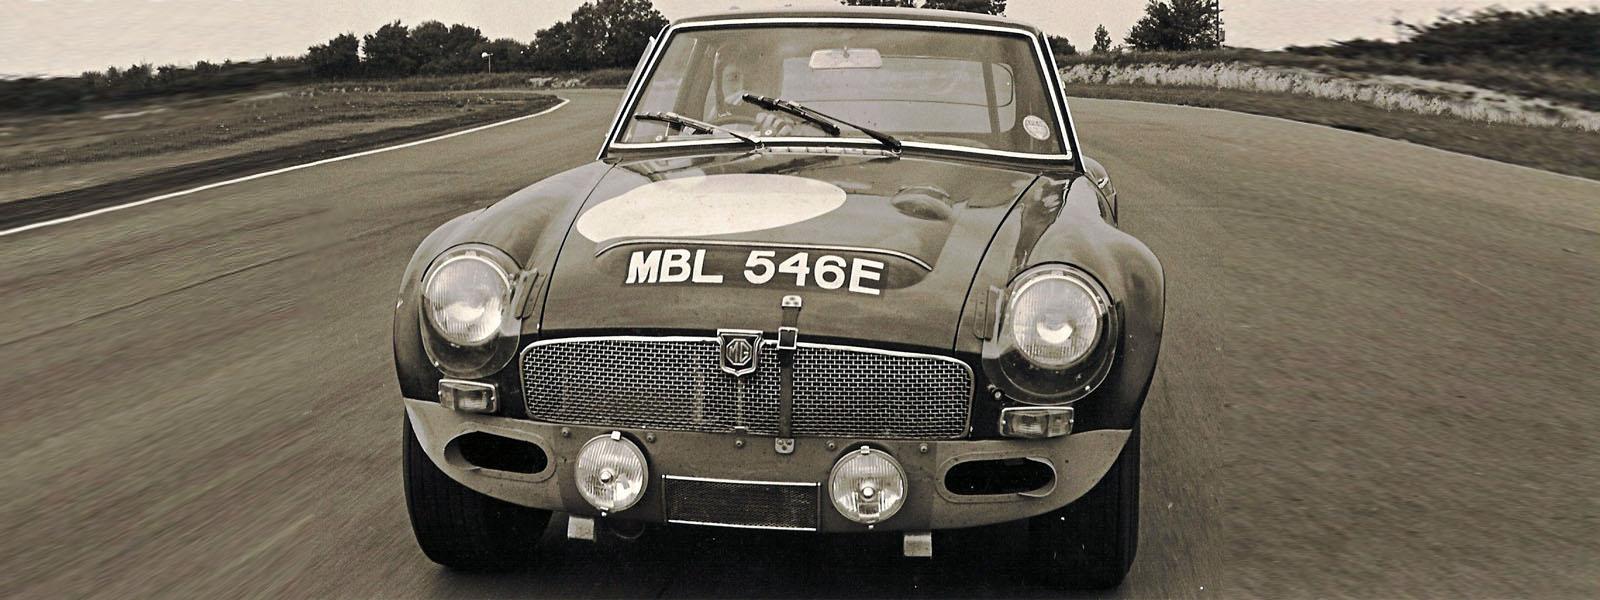 MG GTS Sebring Mabel MBL546E